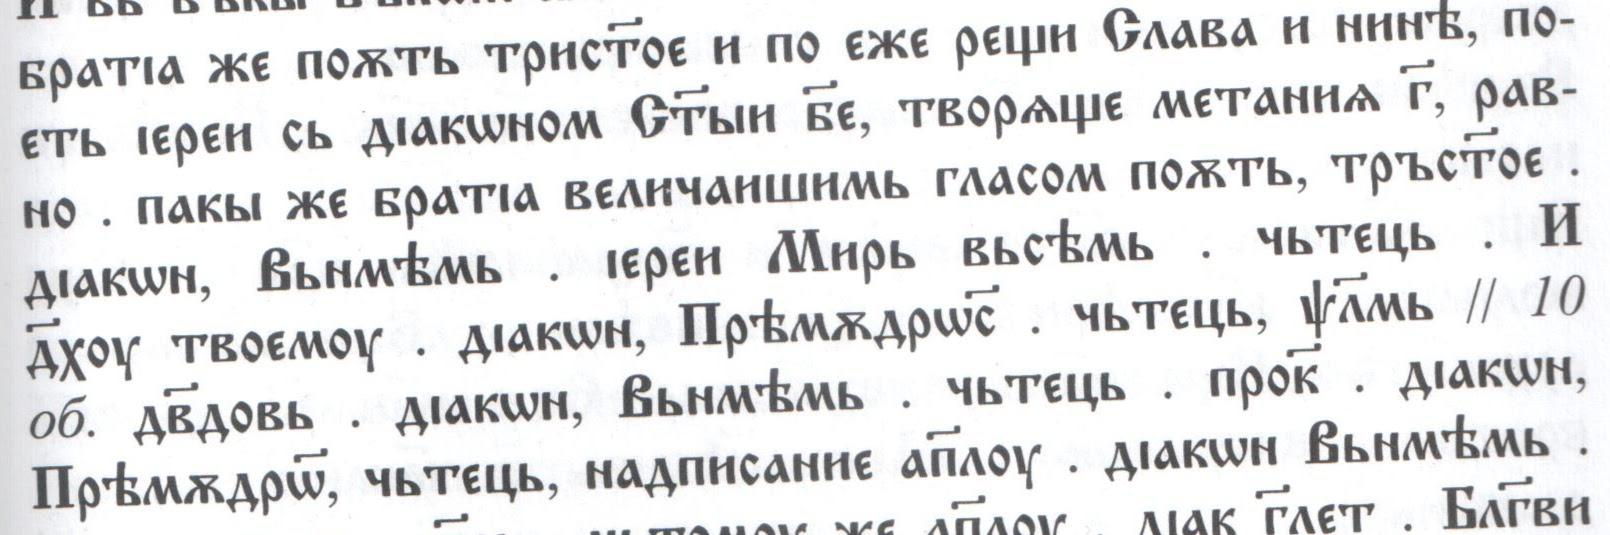 o.A.Pankrarov_edinoverie_ustav_comments-07